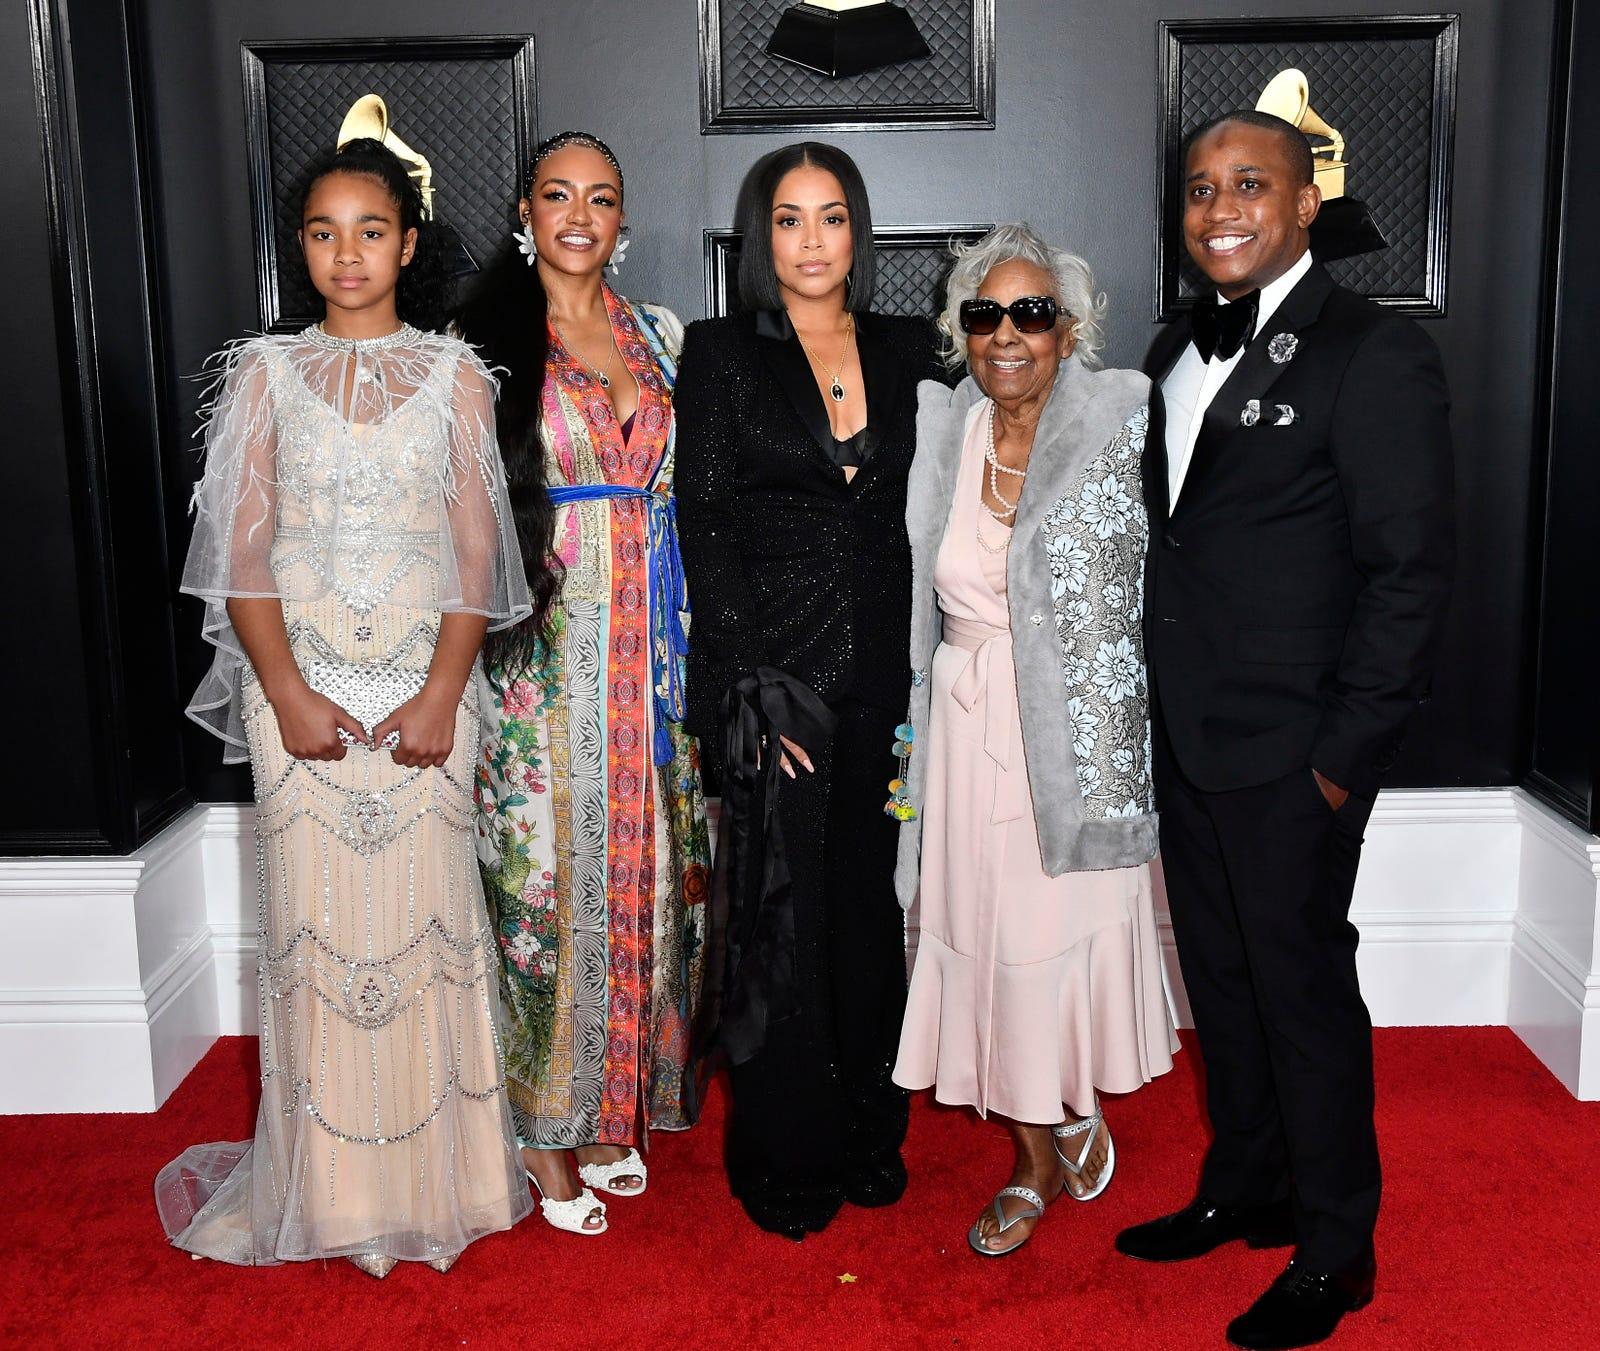 Emani Asghedom, left, Samantha Smith, Lauren London, Margaret Boutte, and Steven Carless